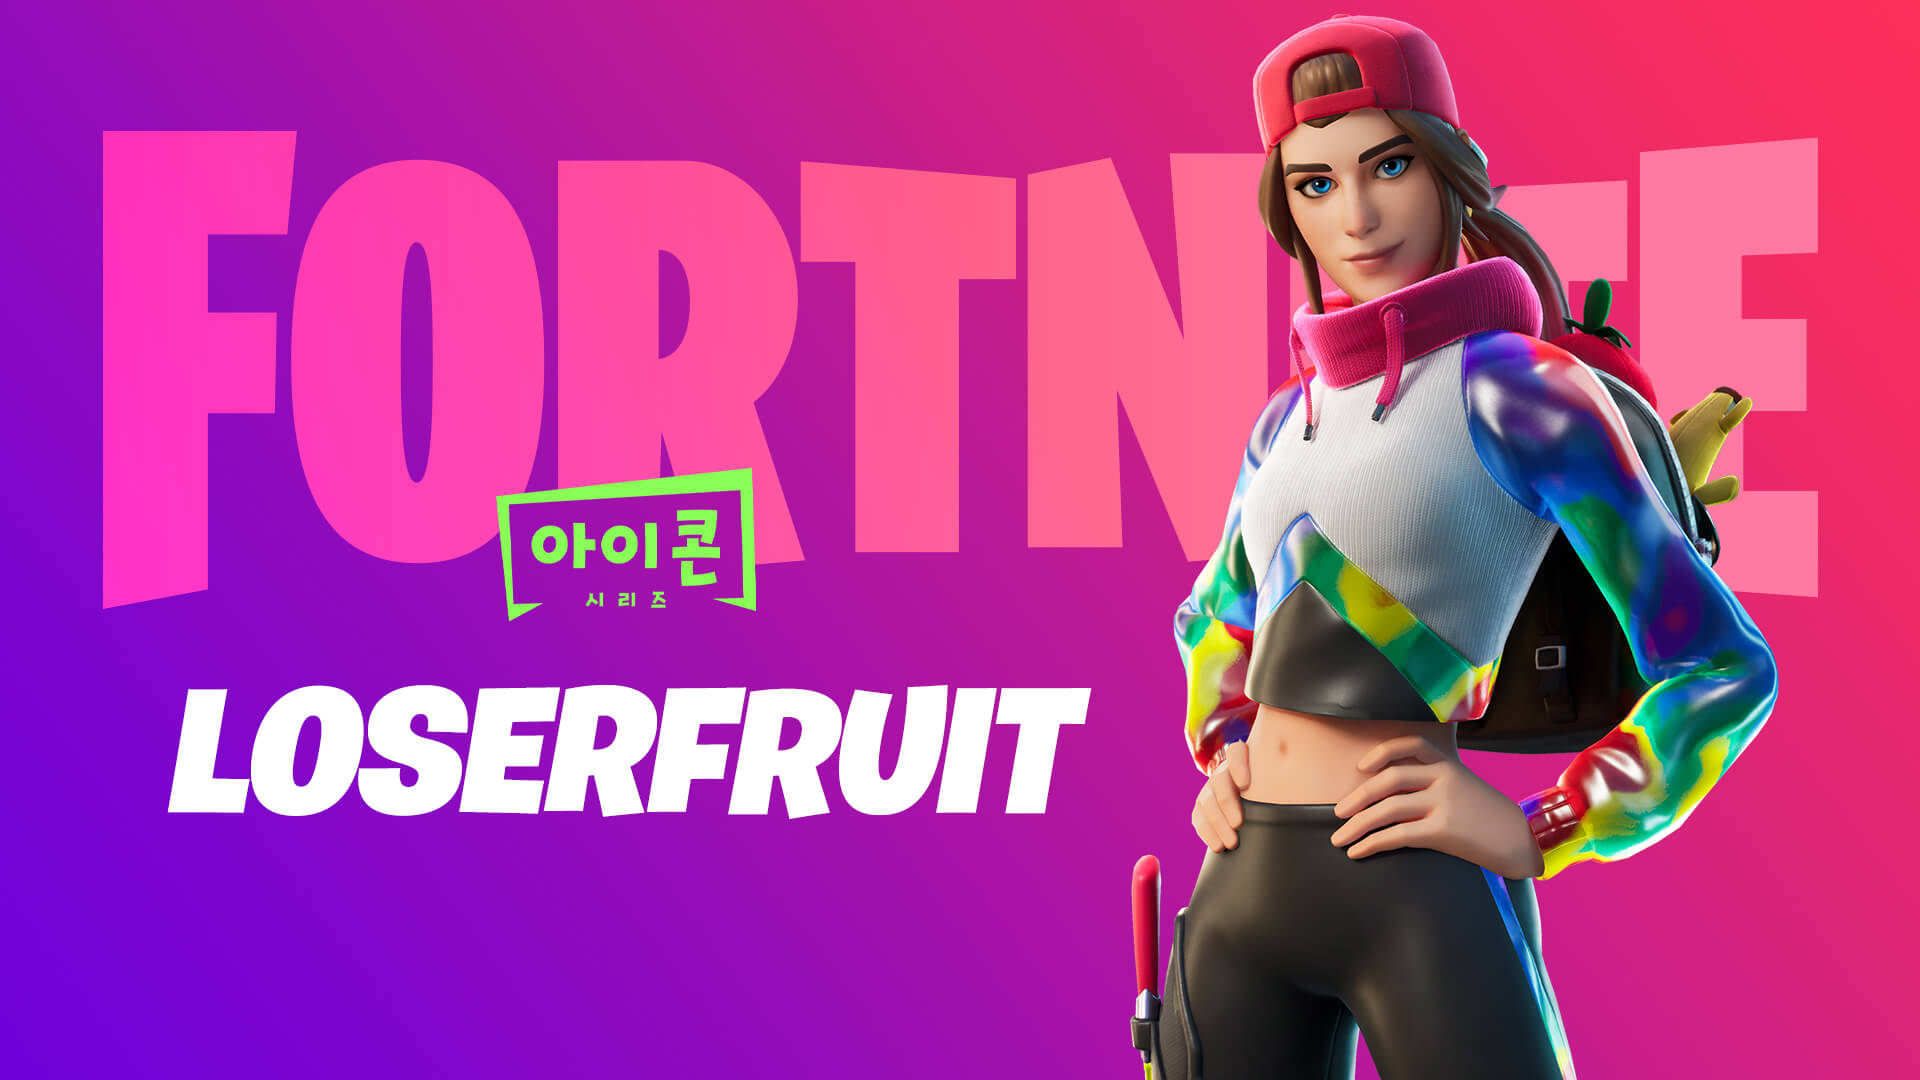 KR 12BR Loserfruit Social Character